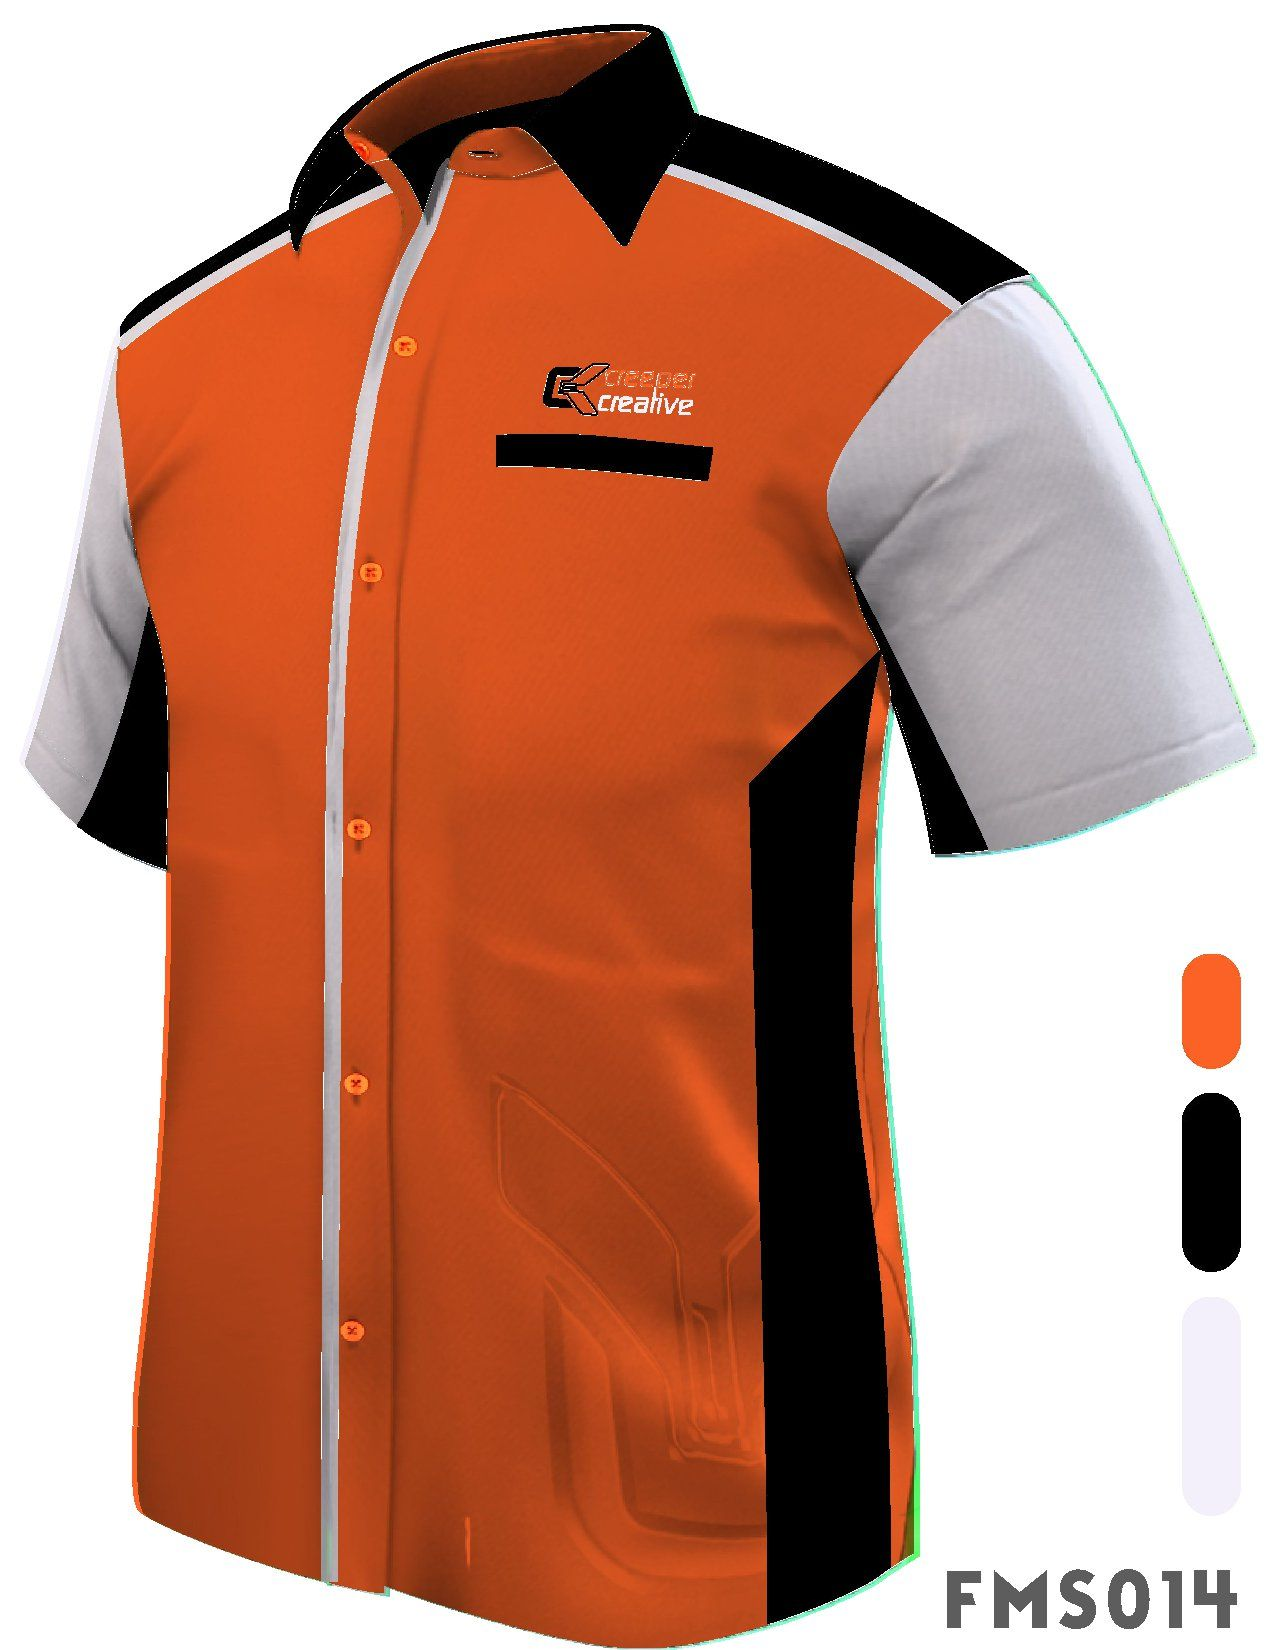 Corporate F1 Shirt Design Template Somurich Com